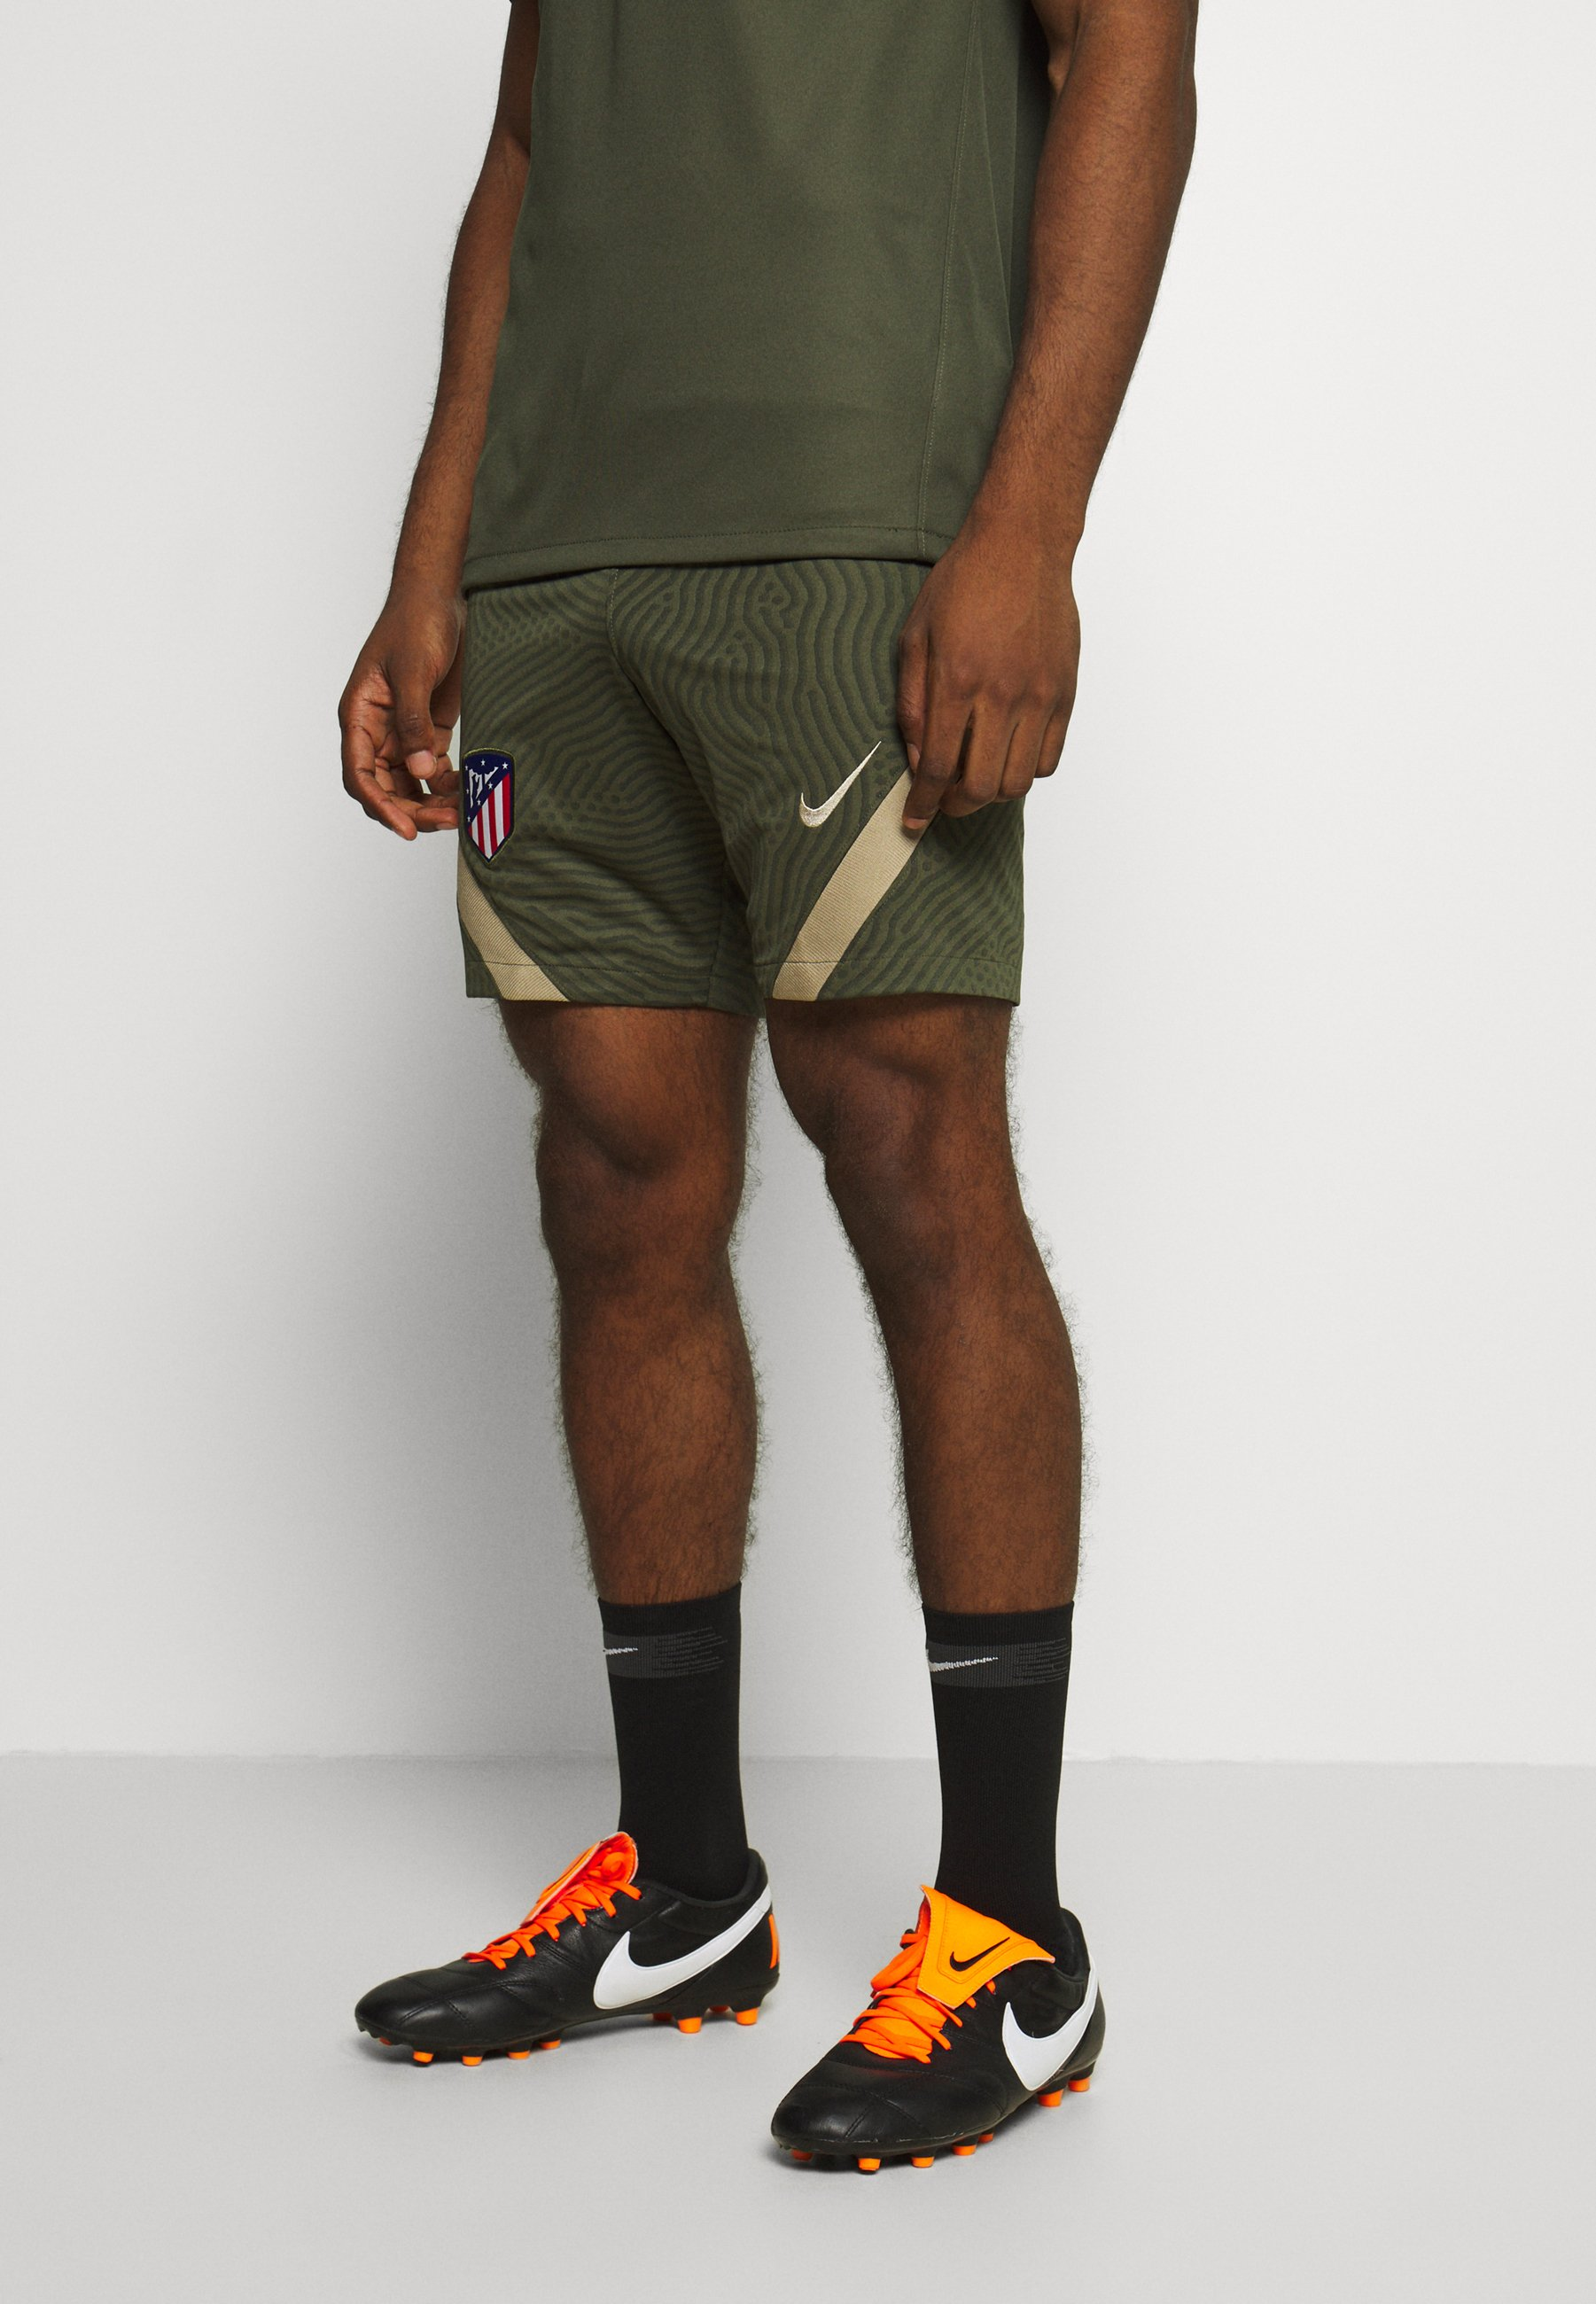 Muestra Aplicado perfil  Nike Performance ATLETICO MADRID DRY SHORT - Pantalón corto de deporte -  cargo khaki/khaki/verde oliva - Zalando.es